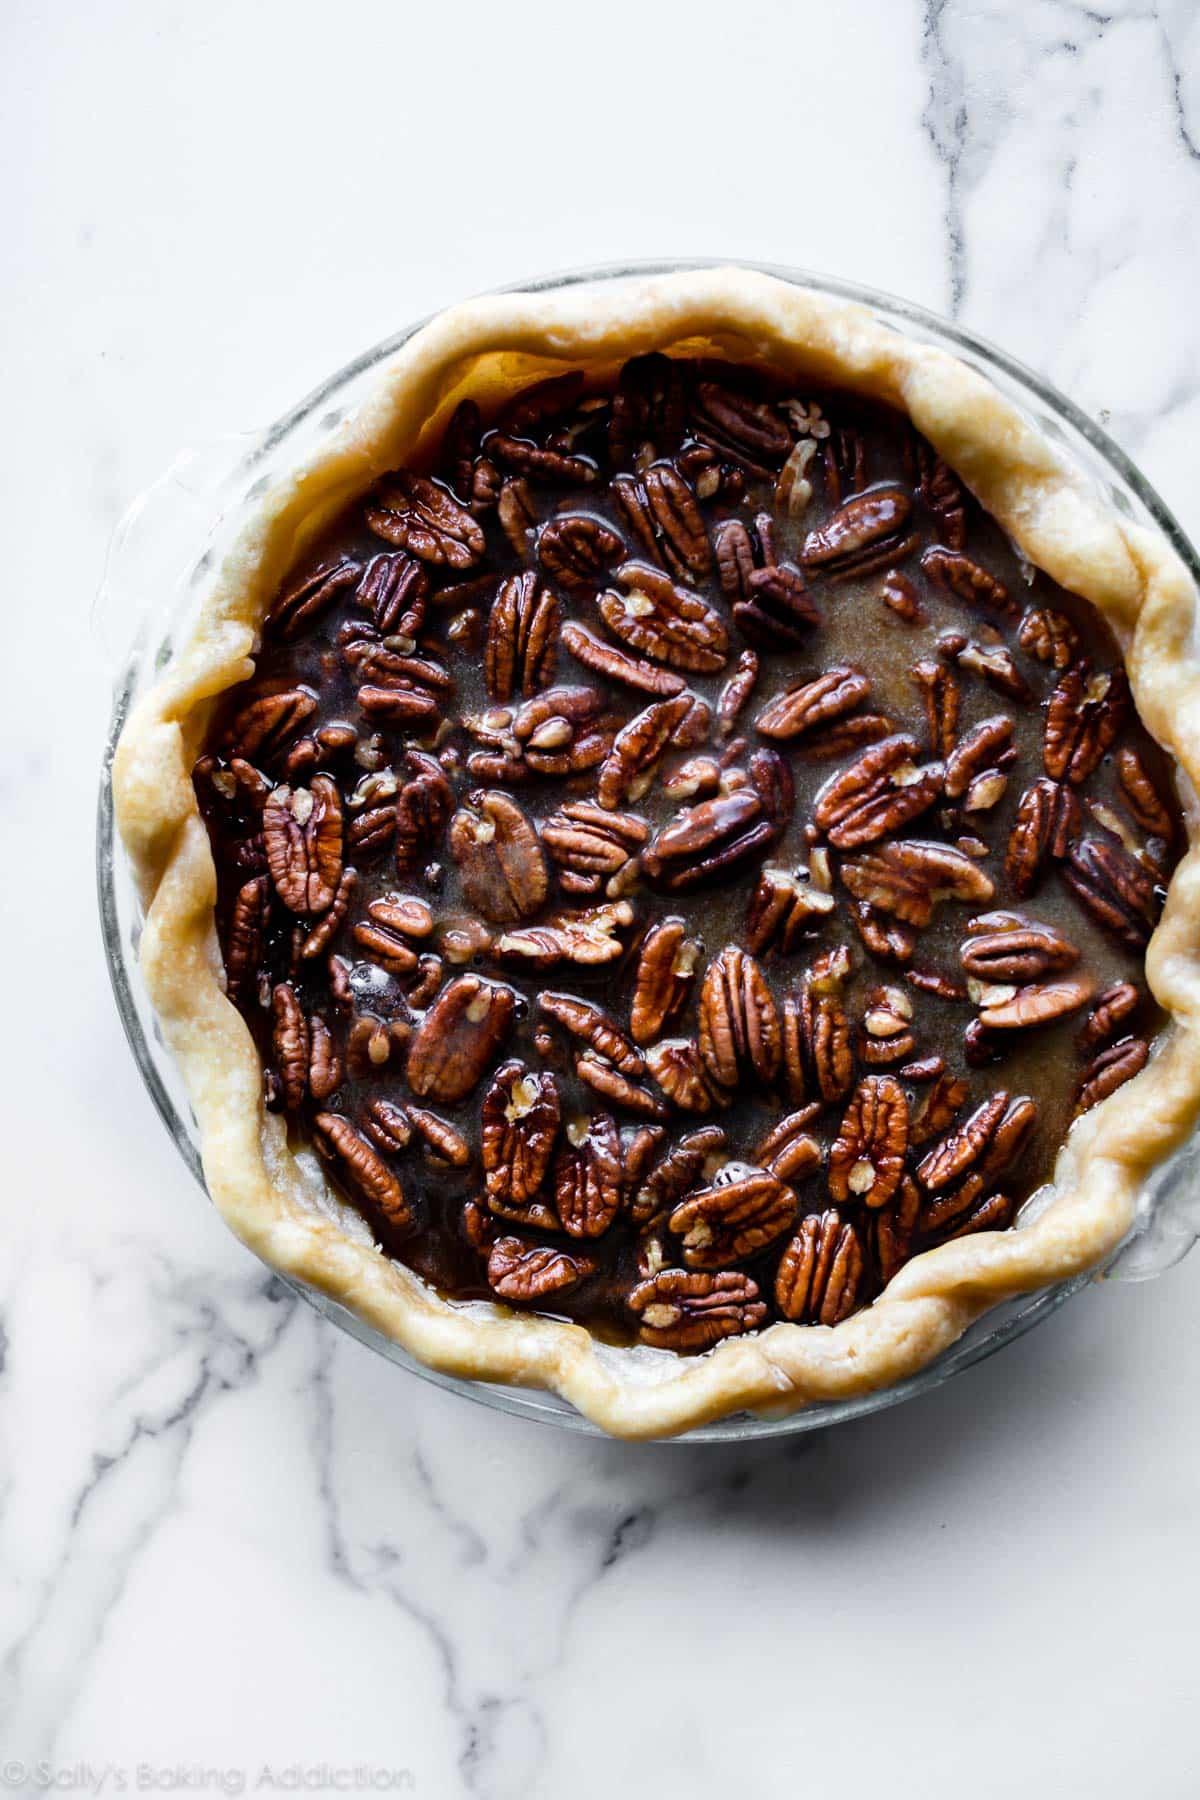 Uncooked maple pecan pie